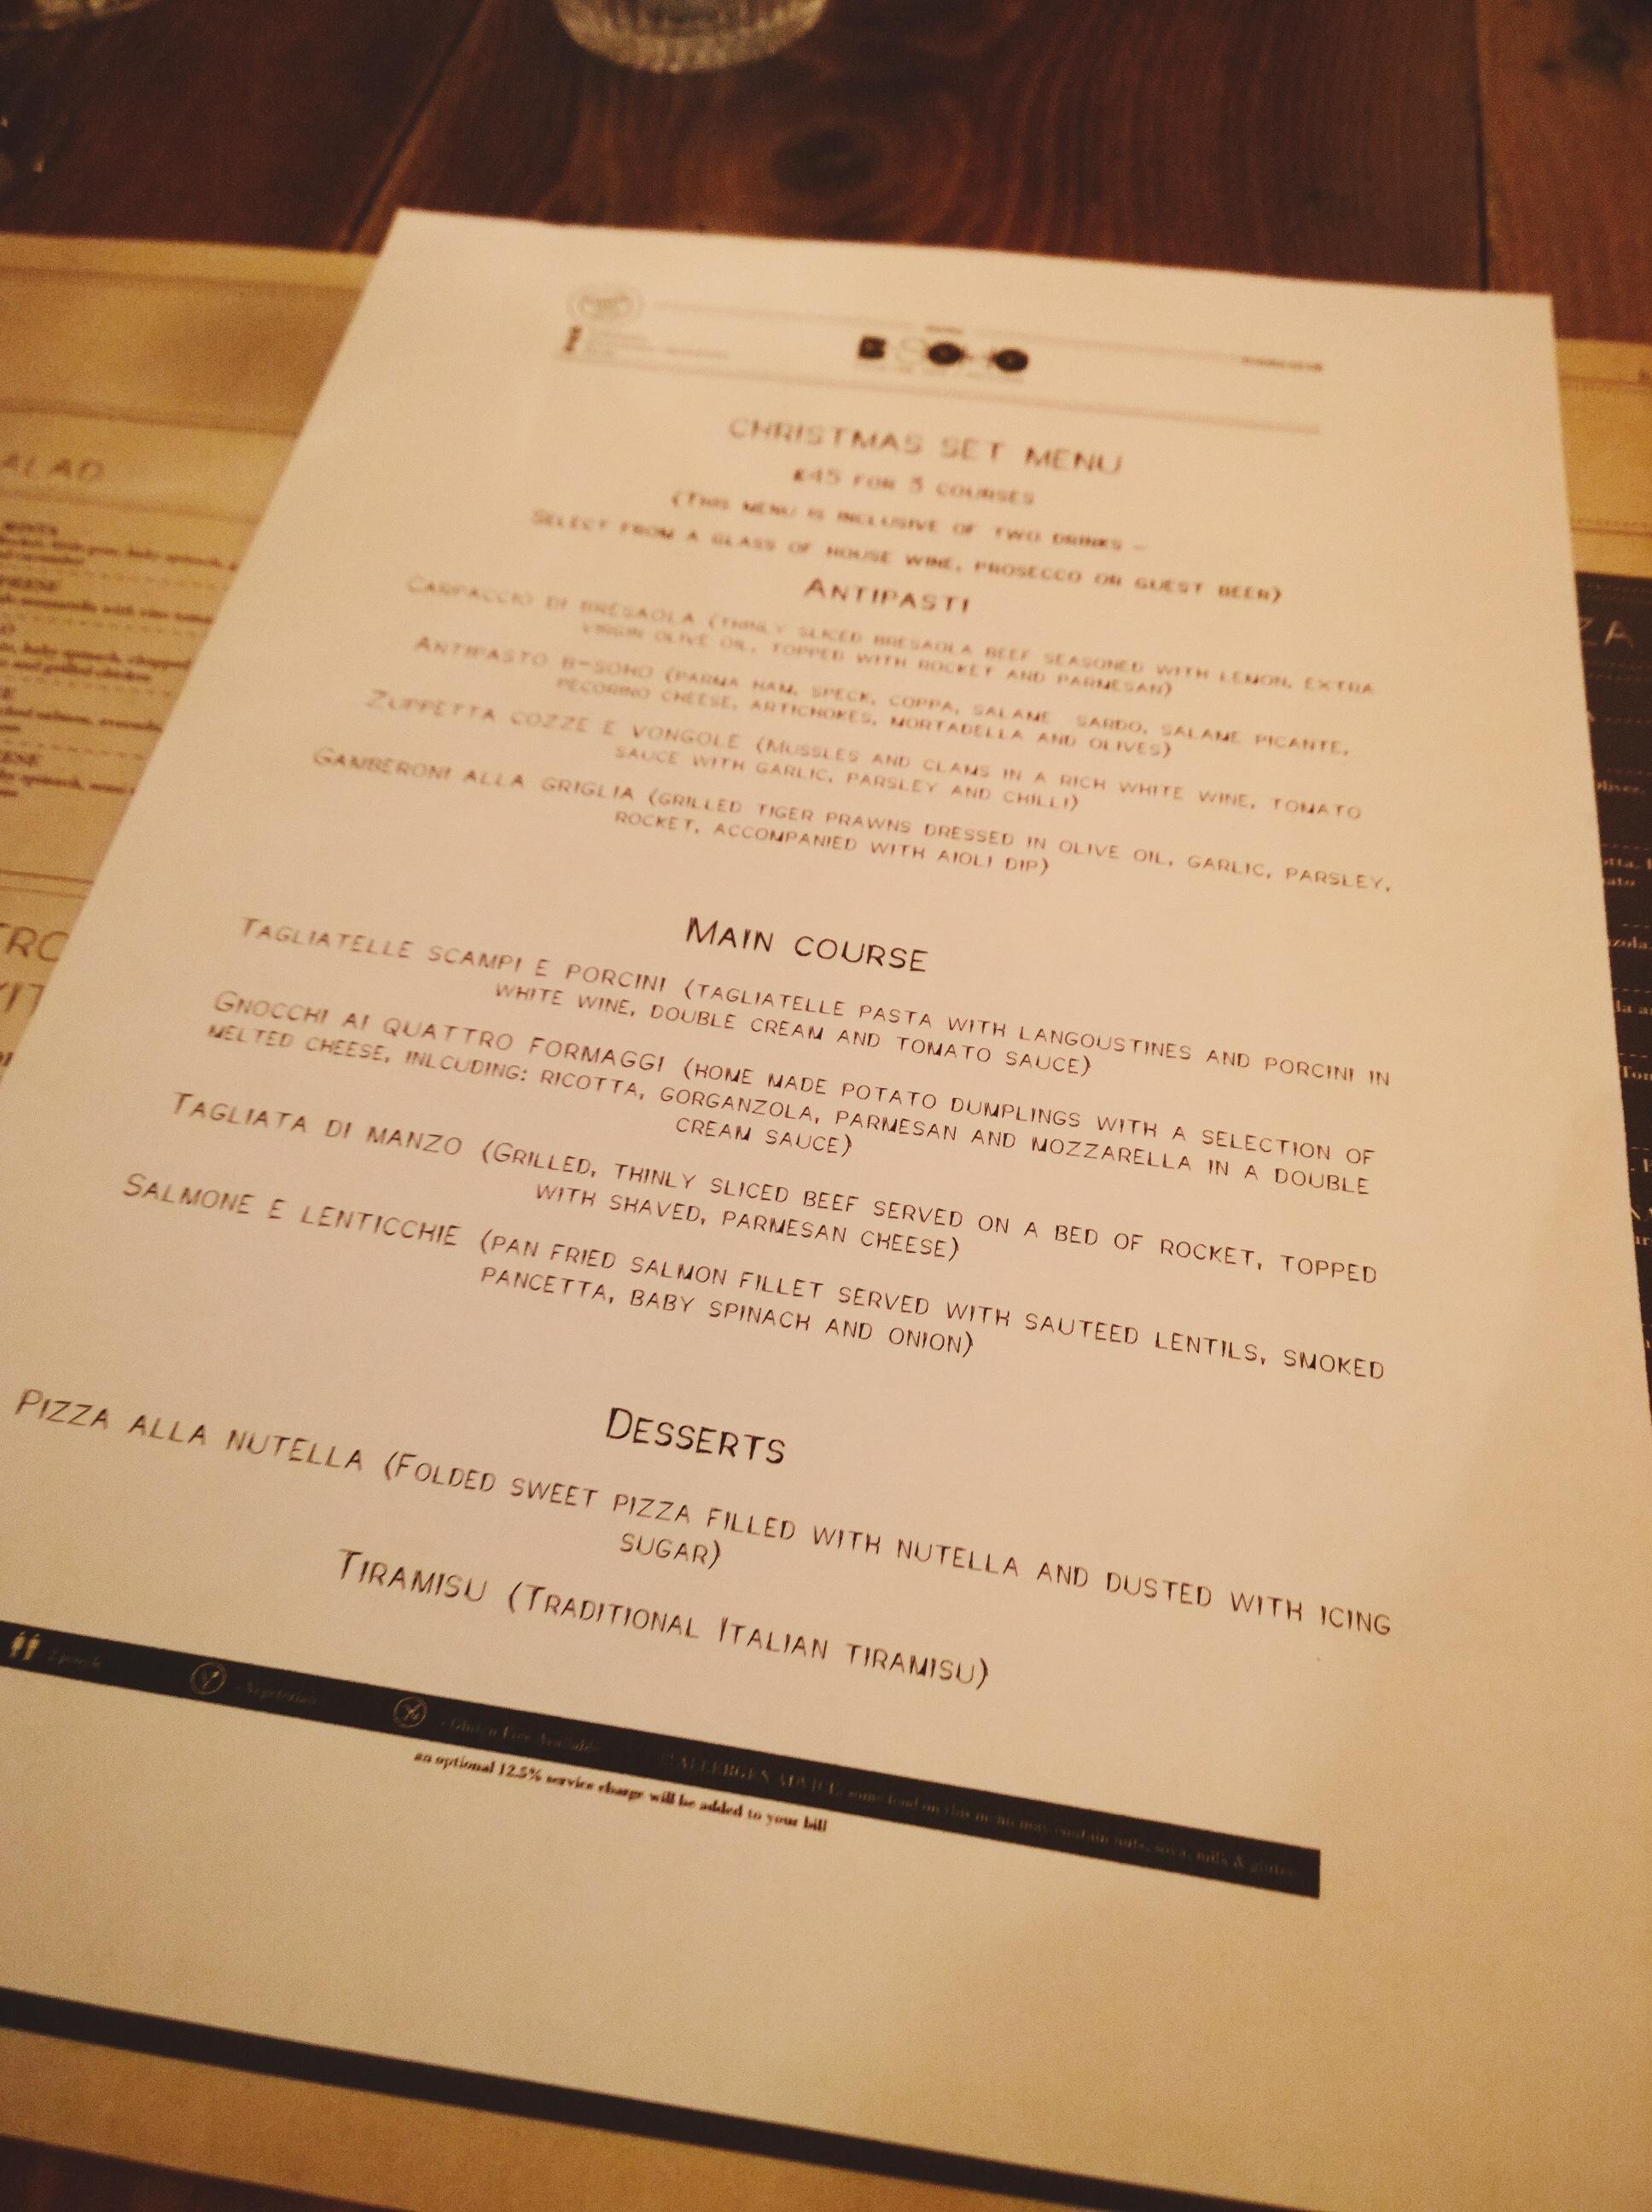 Bsoho christmas set menu